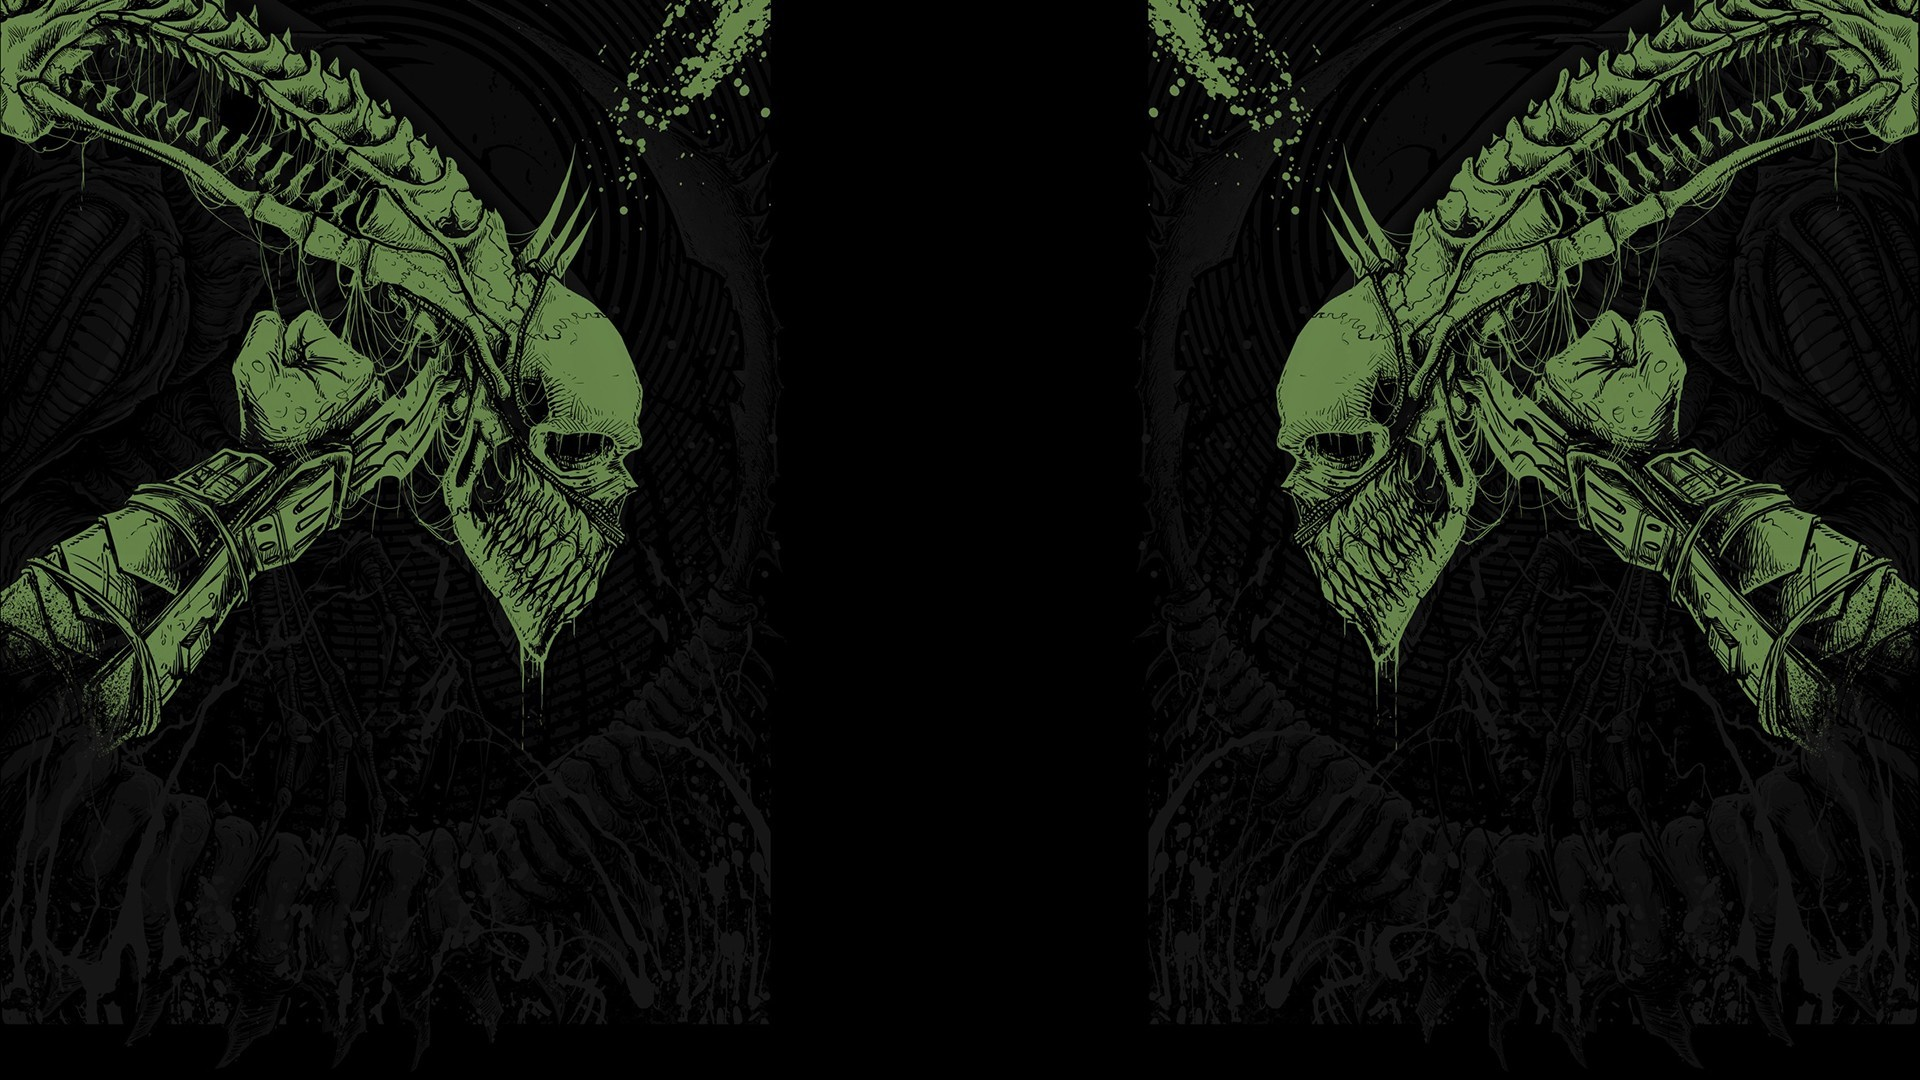 Movies predator science fiction Alien fan art black background H_R_ Giger  wallpaper     199468   WallpaperUP